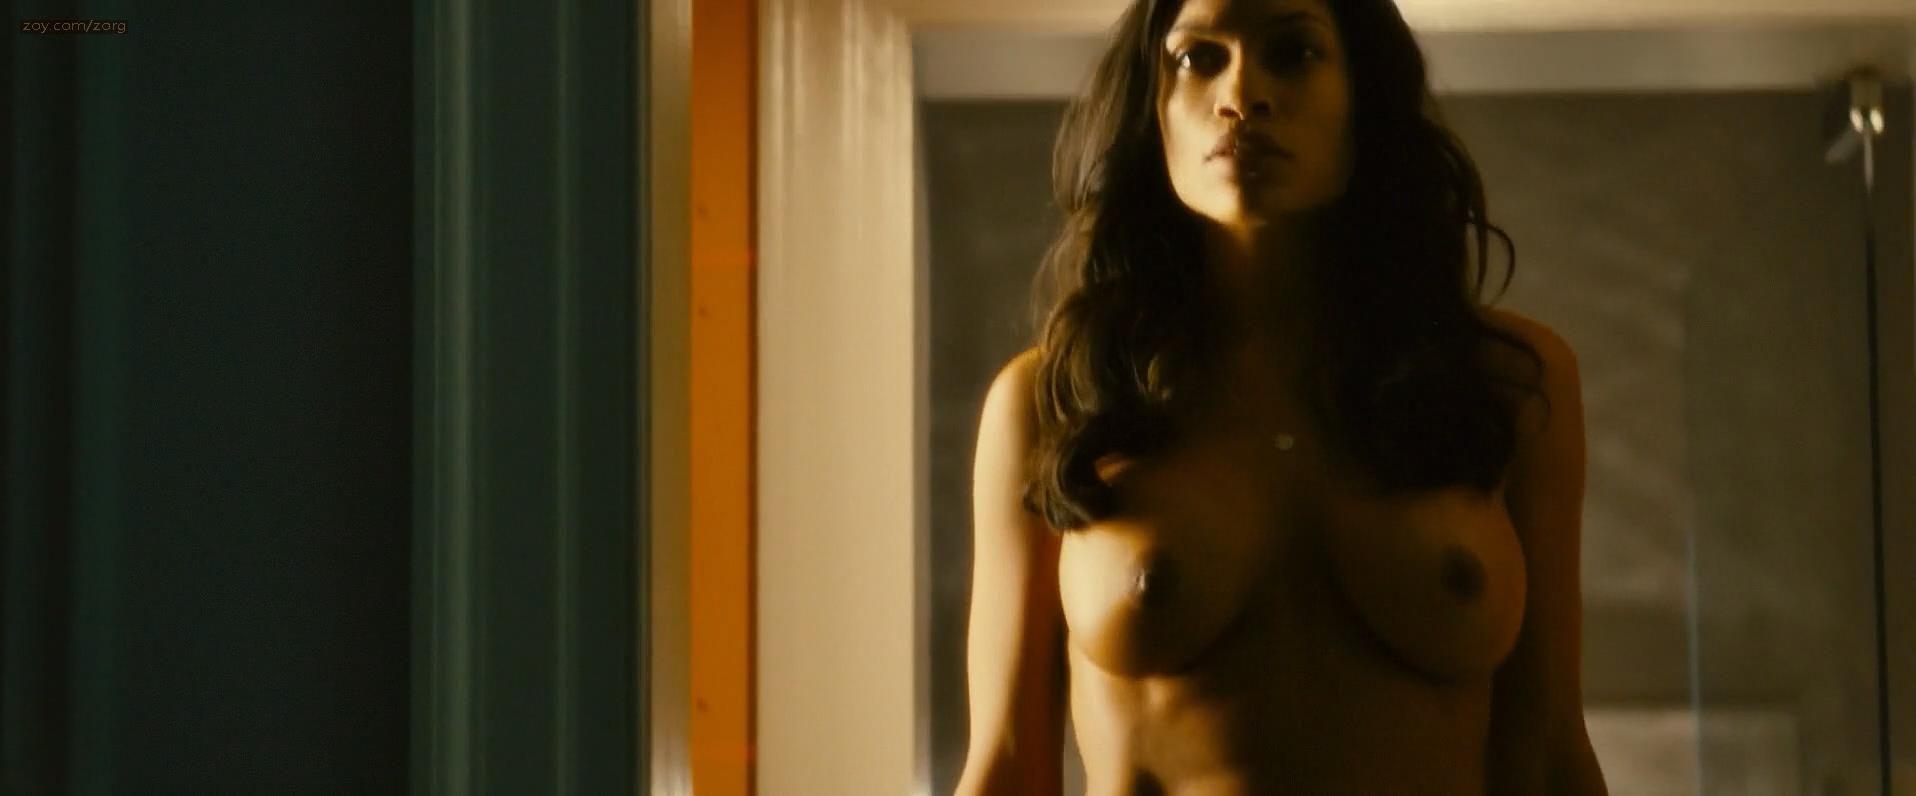 Розарио доусон в порно 15 фотография